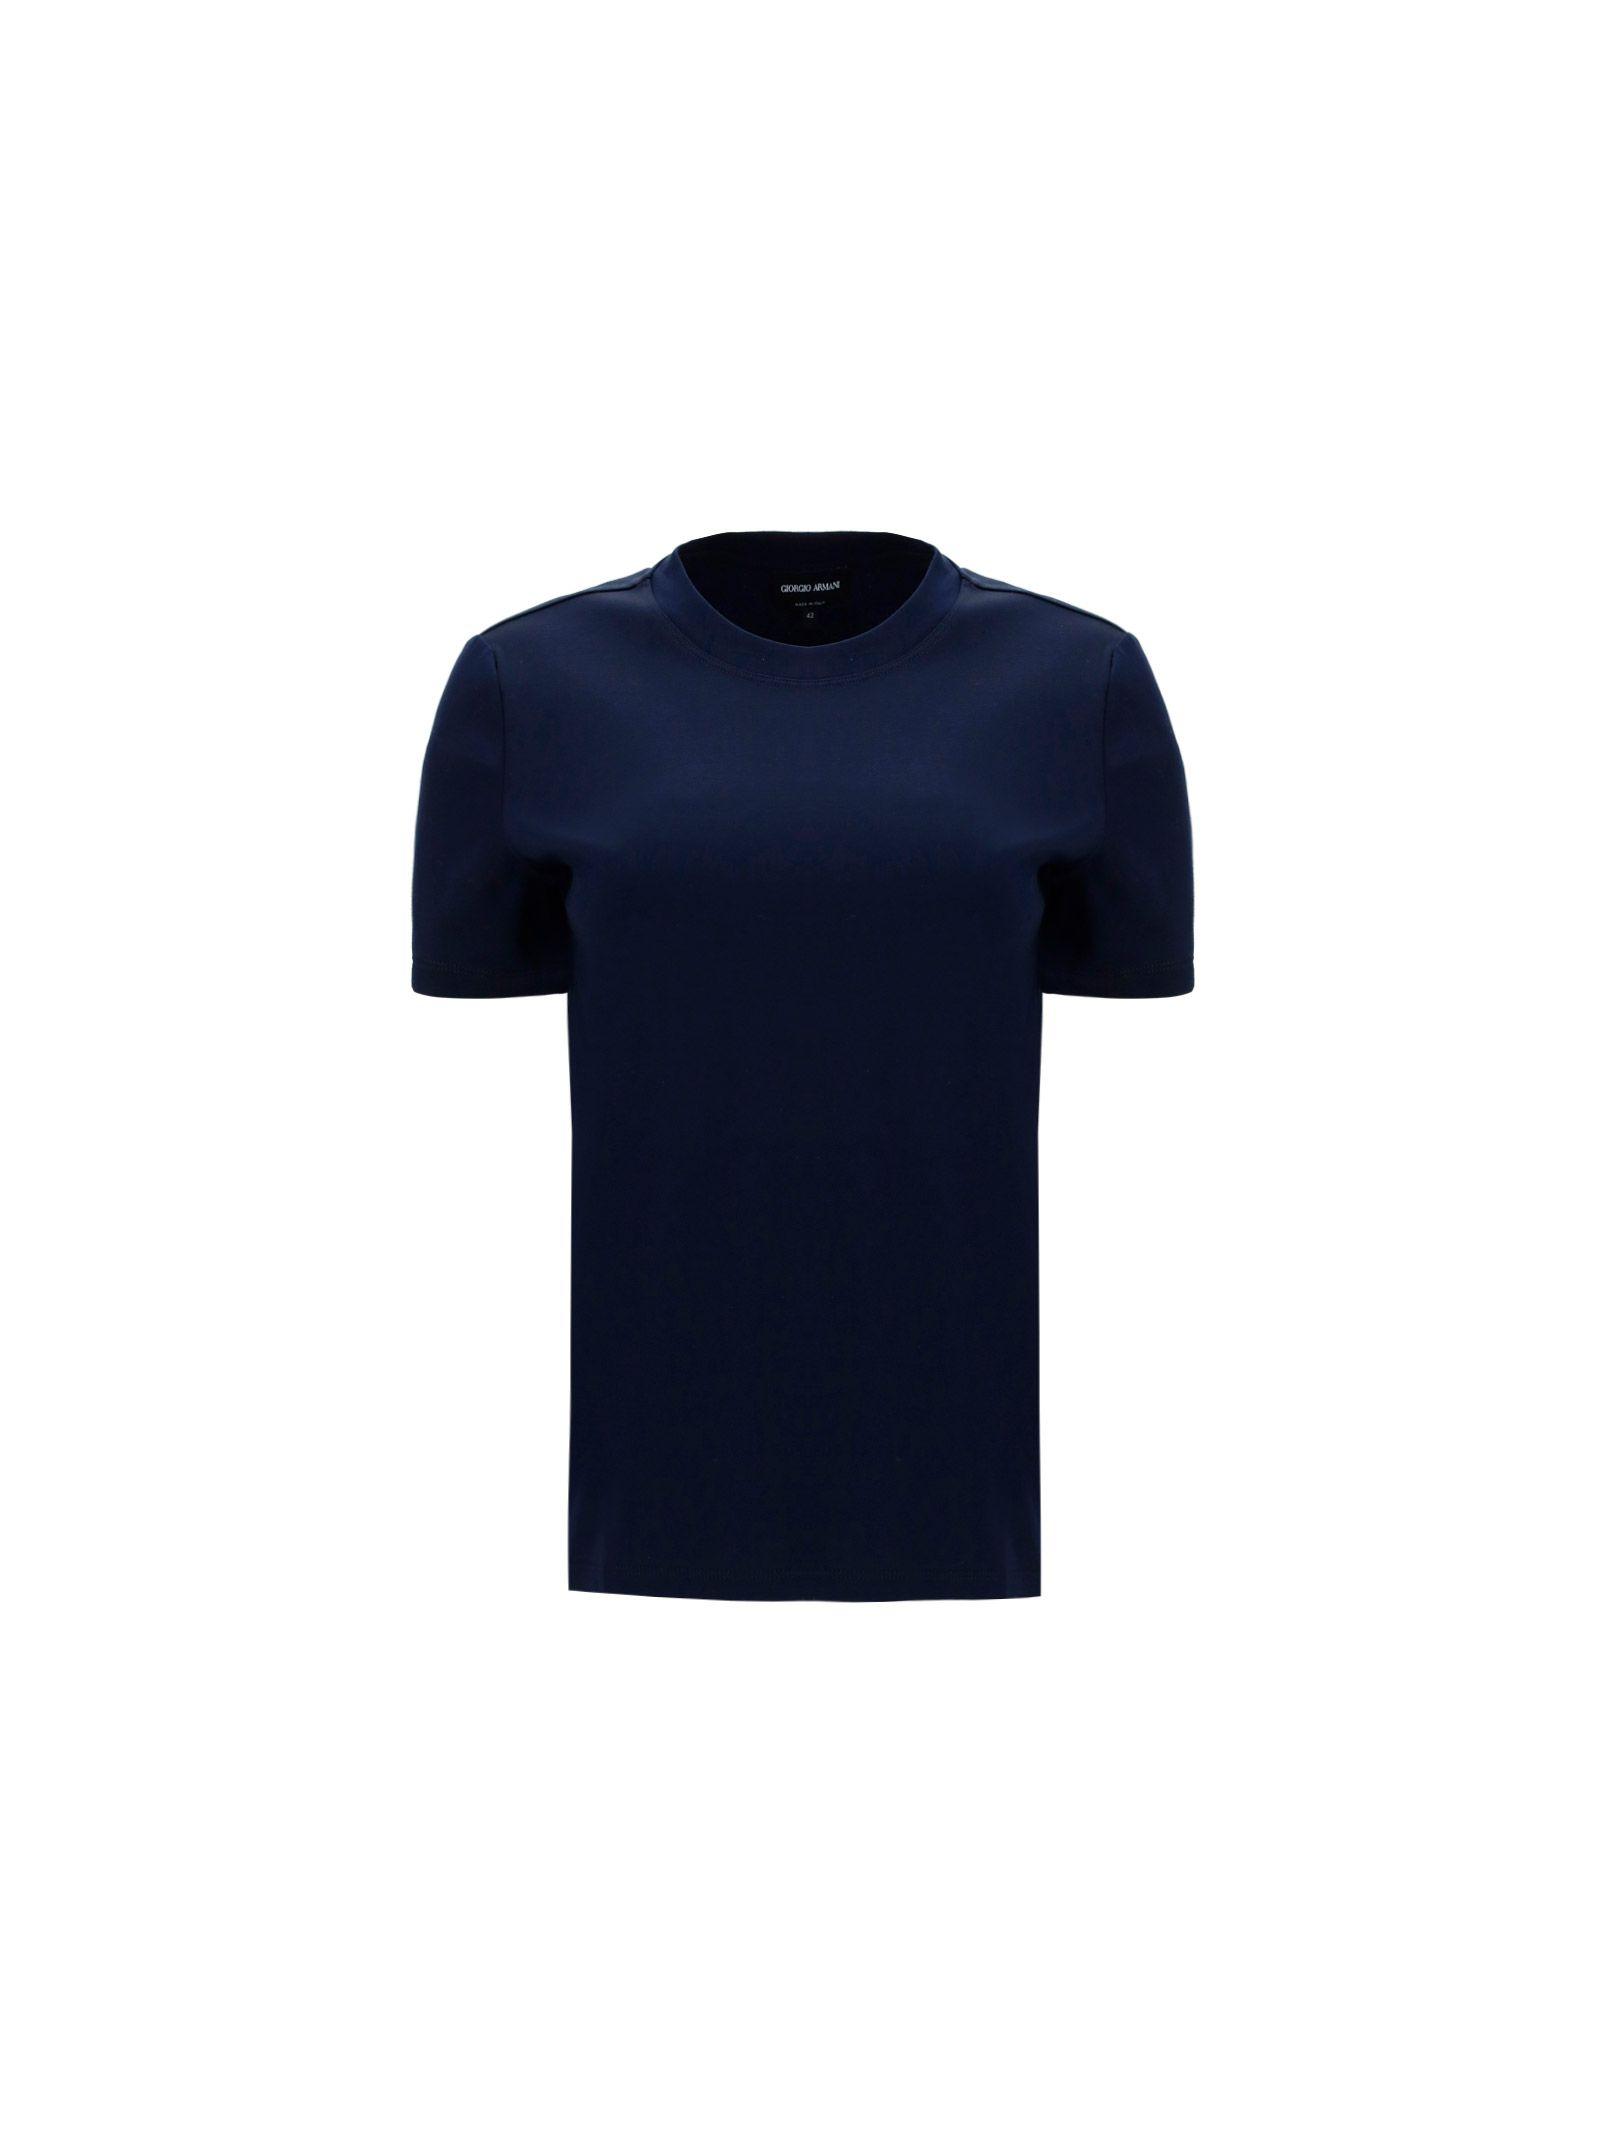 Giorgio Armani T-shirts GIORGIO ARMANI WOMEN'S BLUE OTHER MATERIALS T-SHIRT